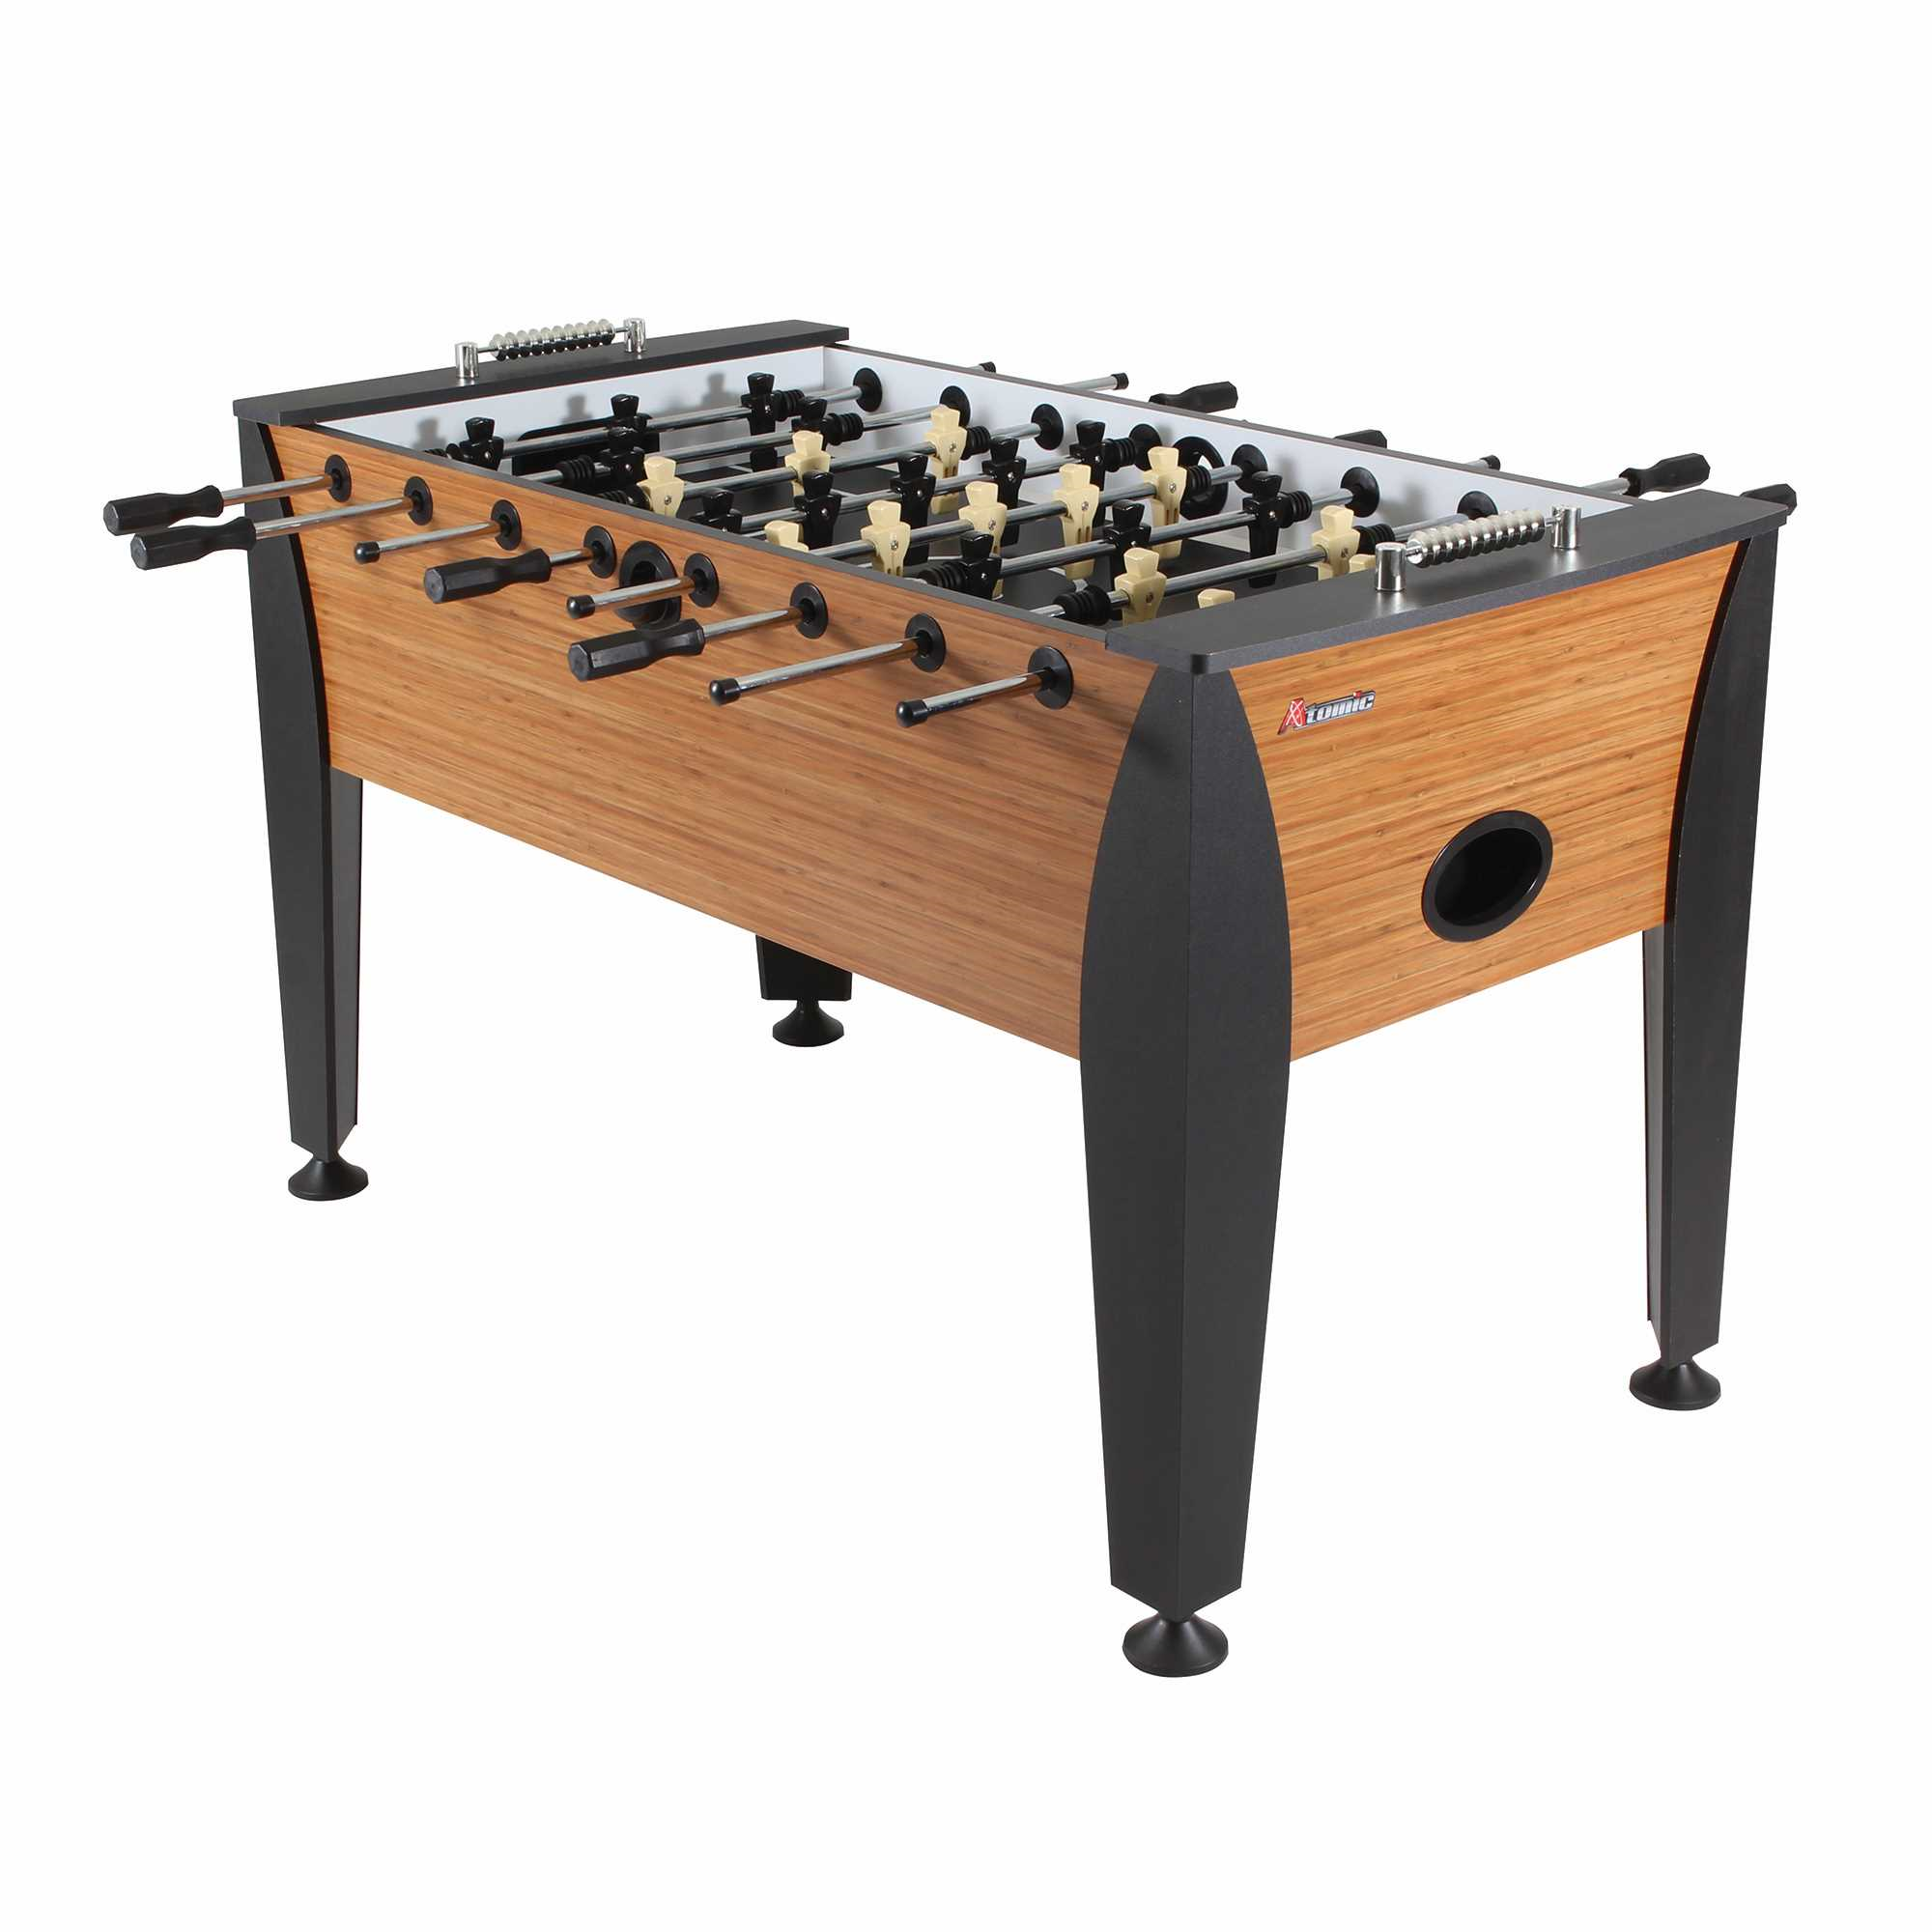 "Atomic ProForce 56"" Foosball Table"